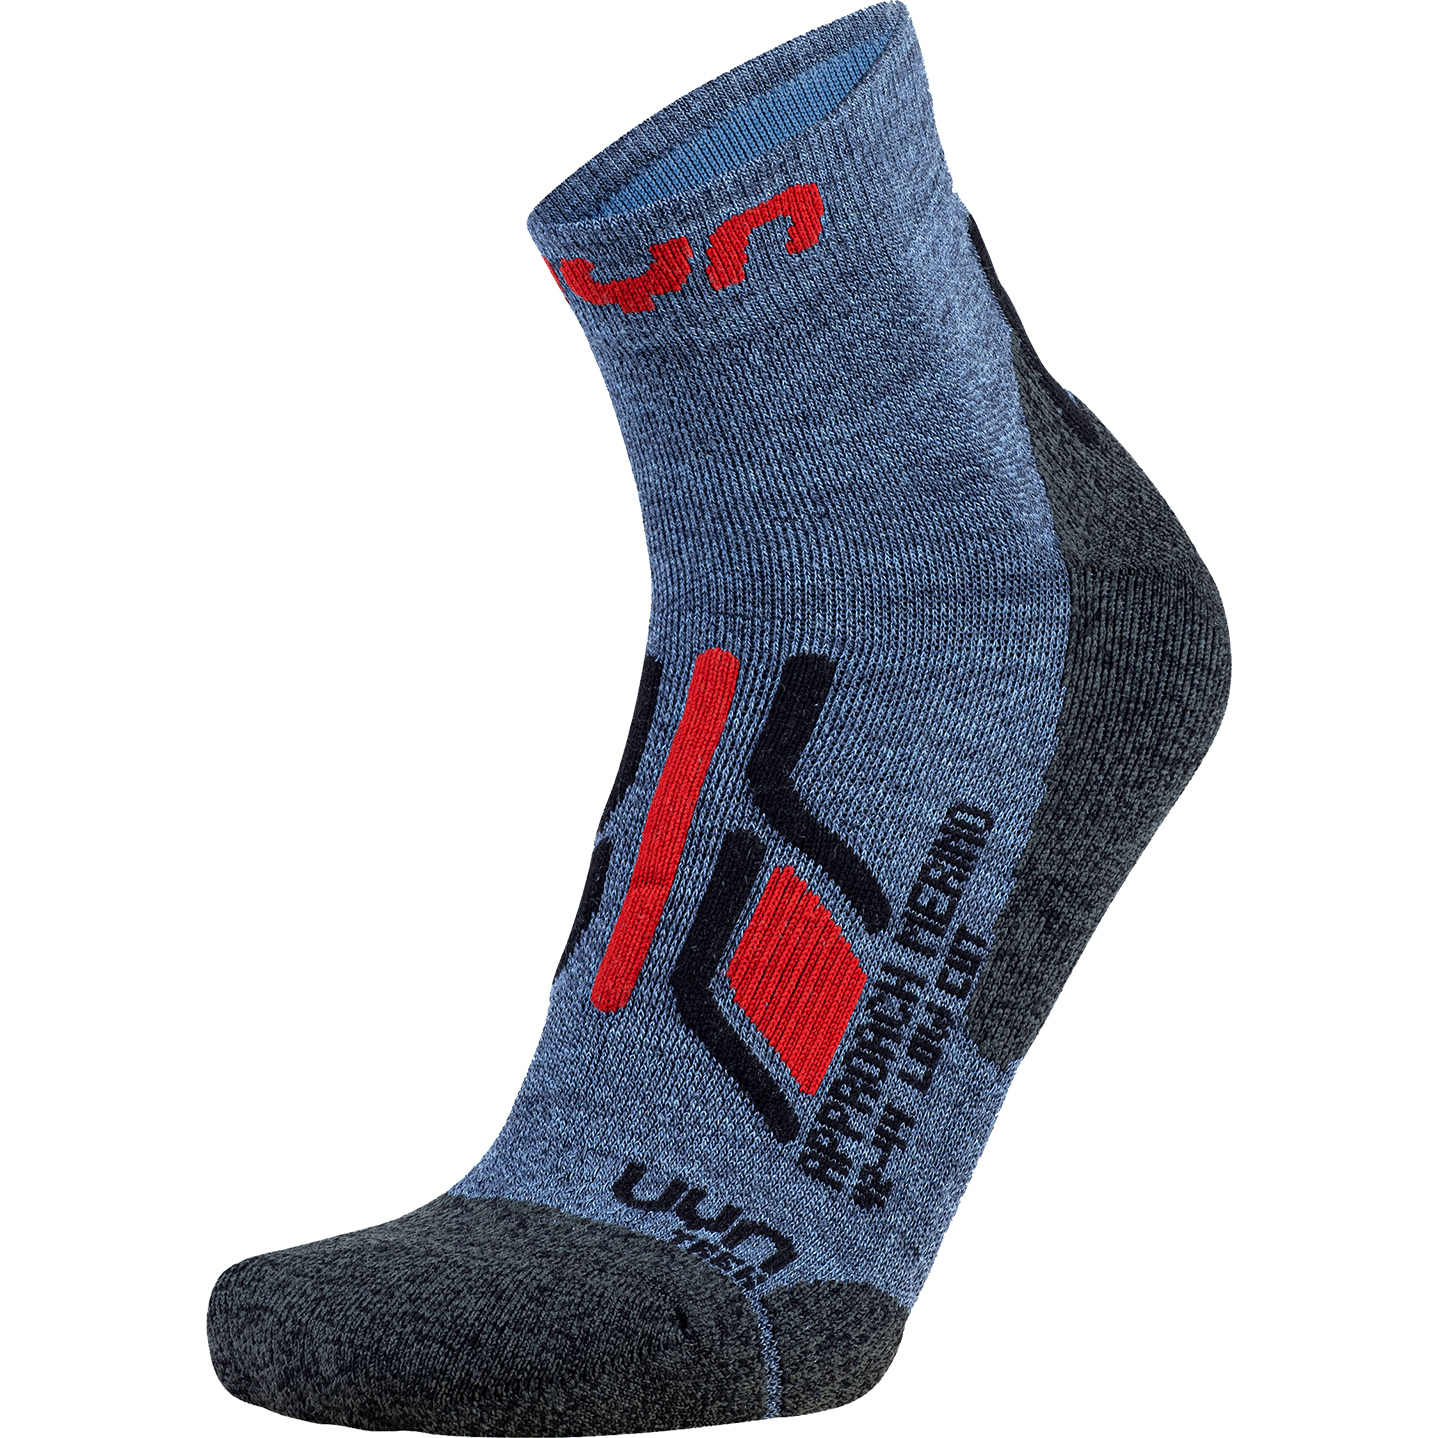 UYN Trekking Approach Merino Low Cut Socken - Jeans/Anthracite/Red